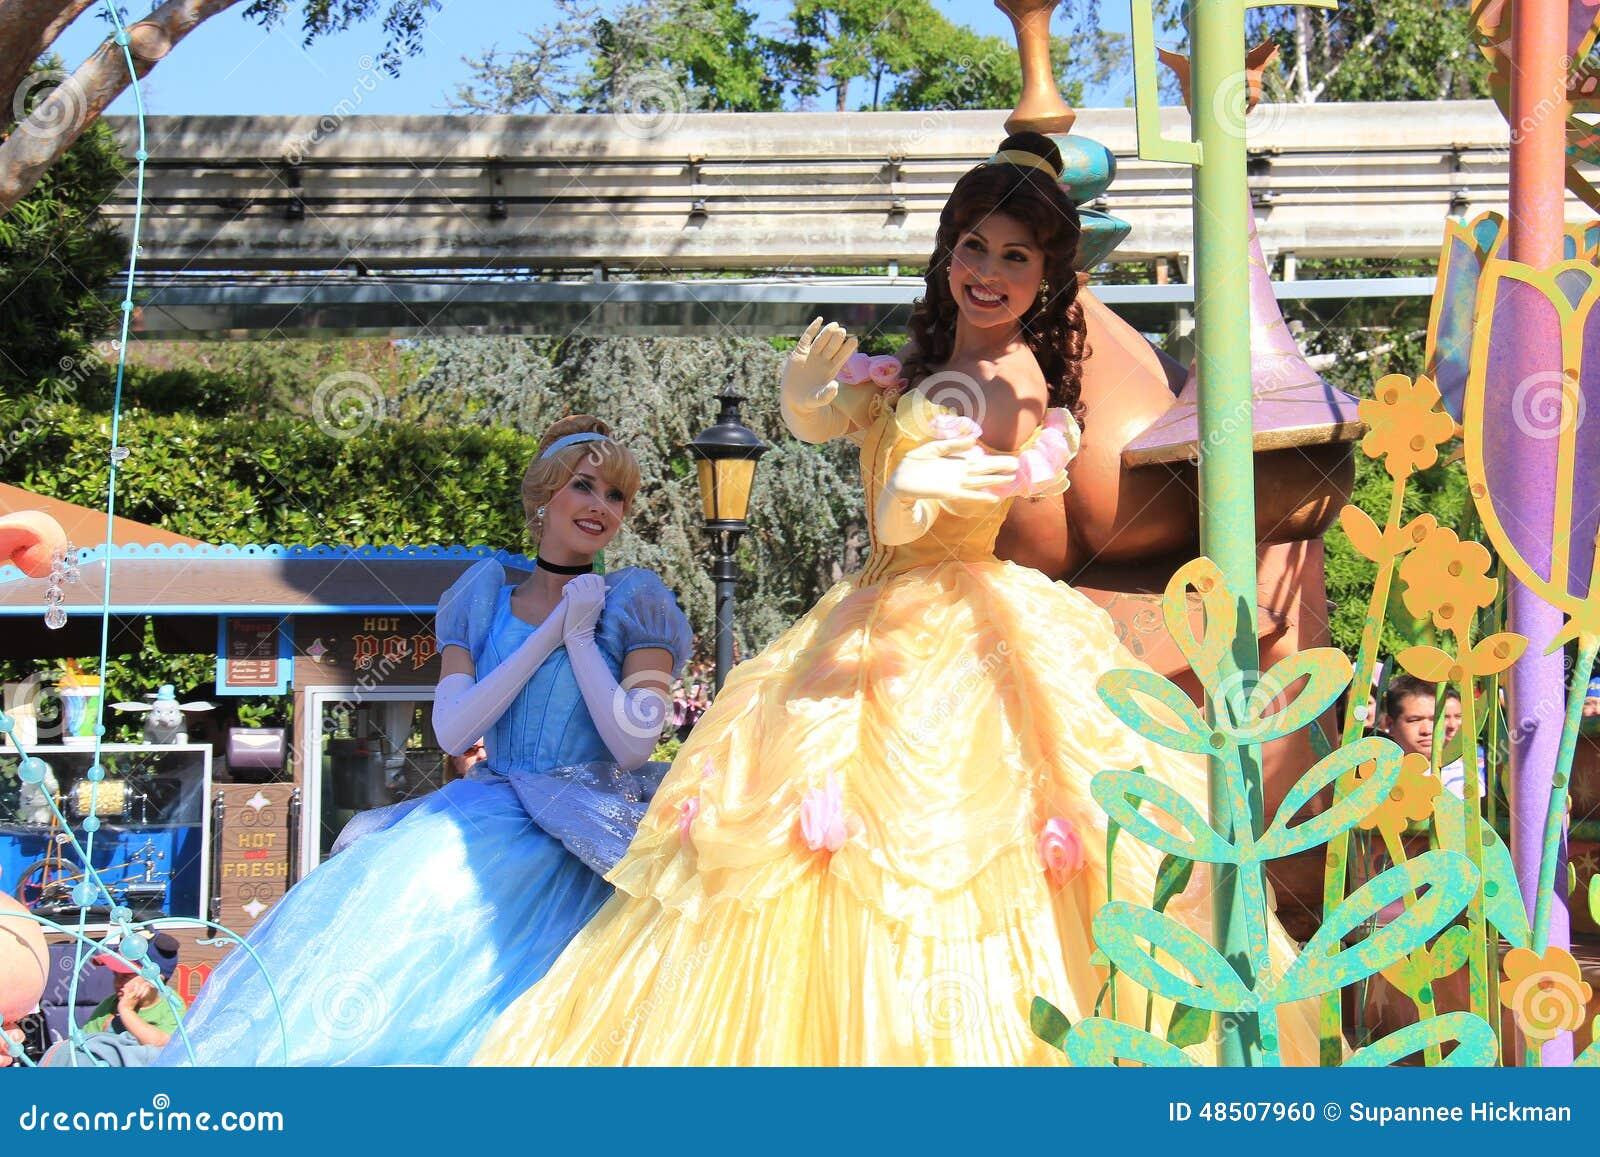 cinderella and princess belle at disneyland editorial